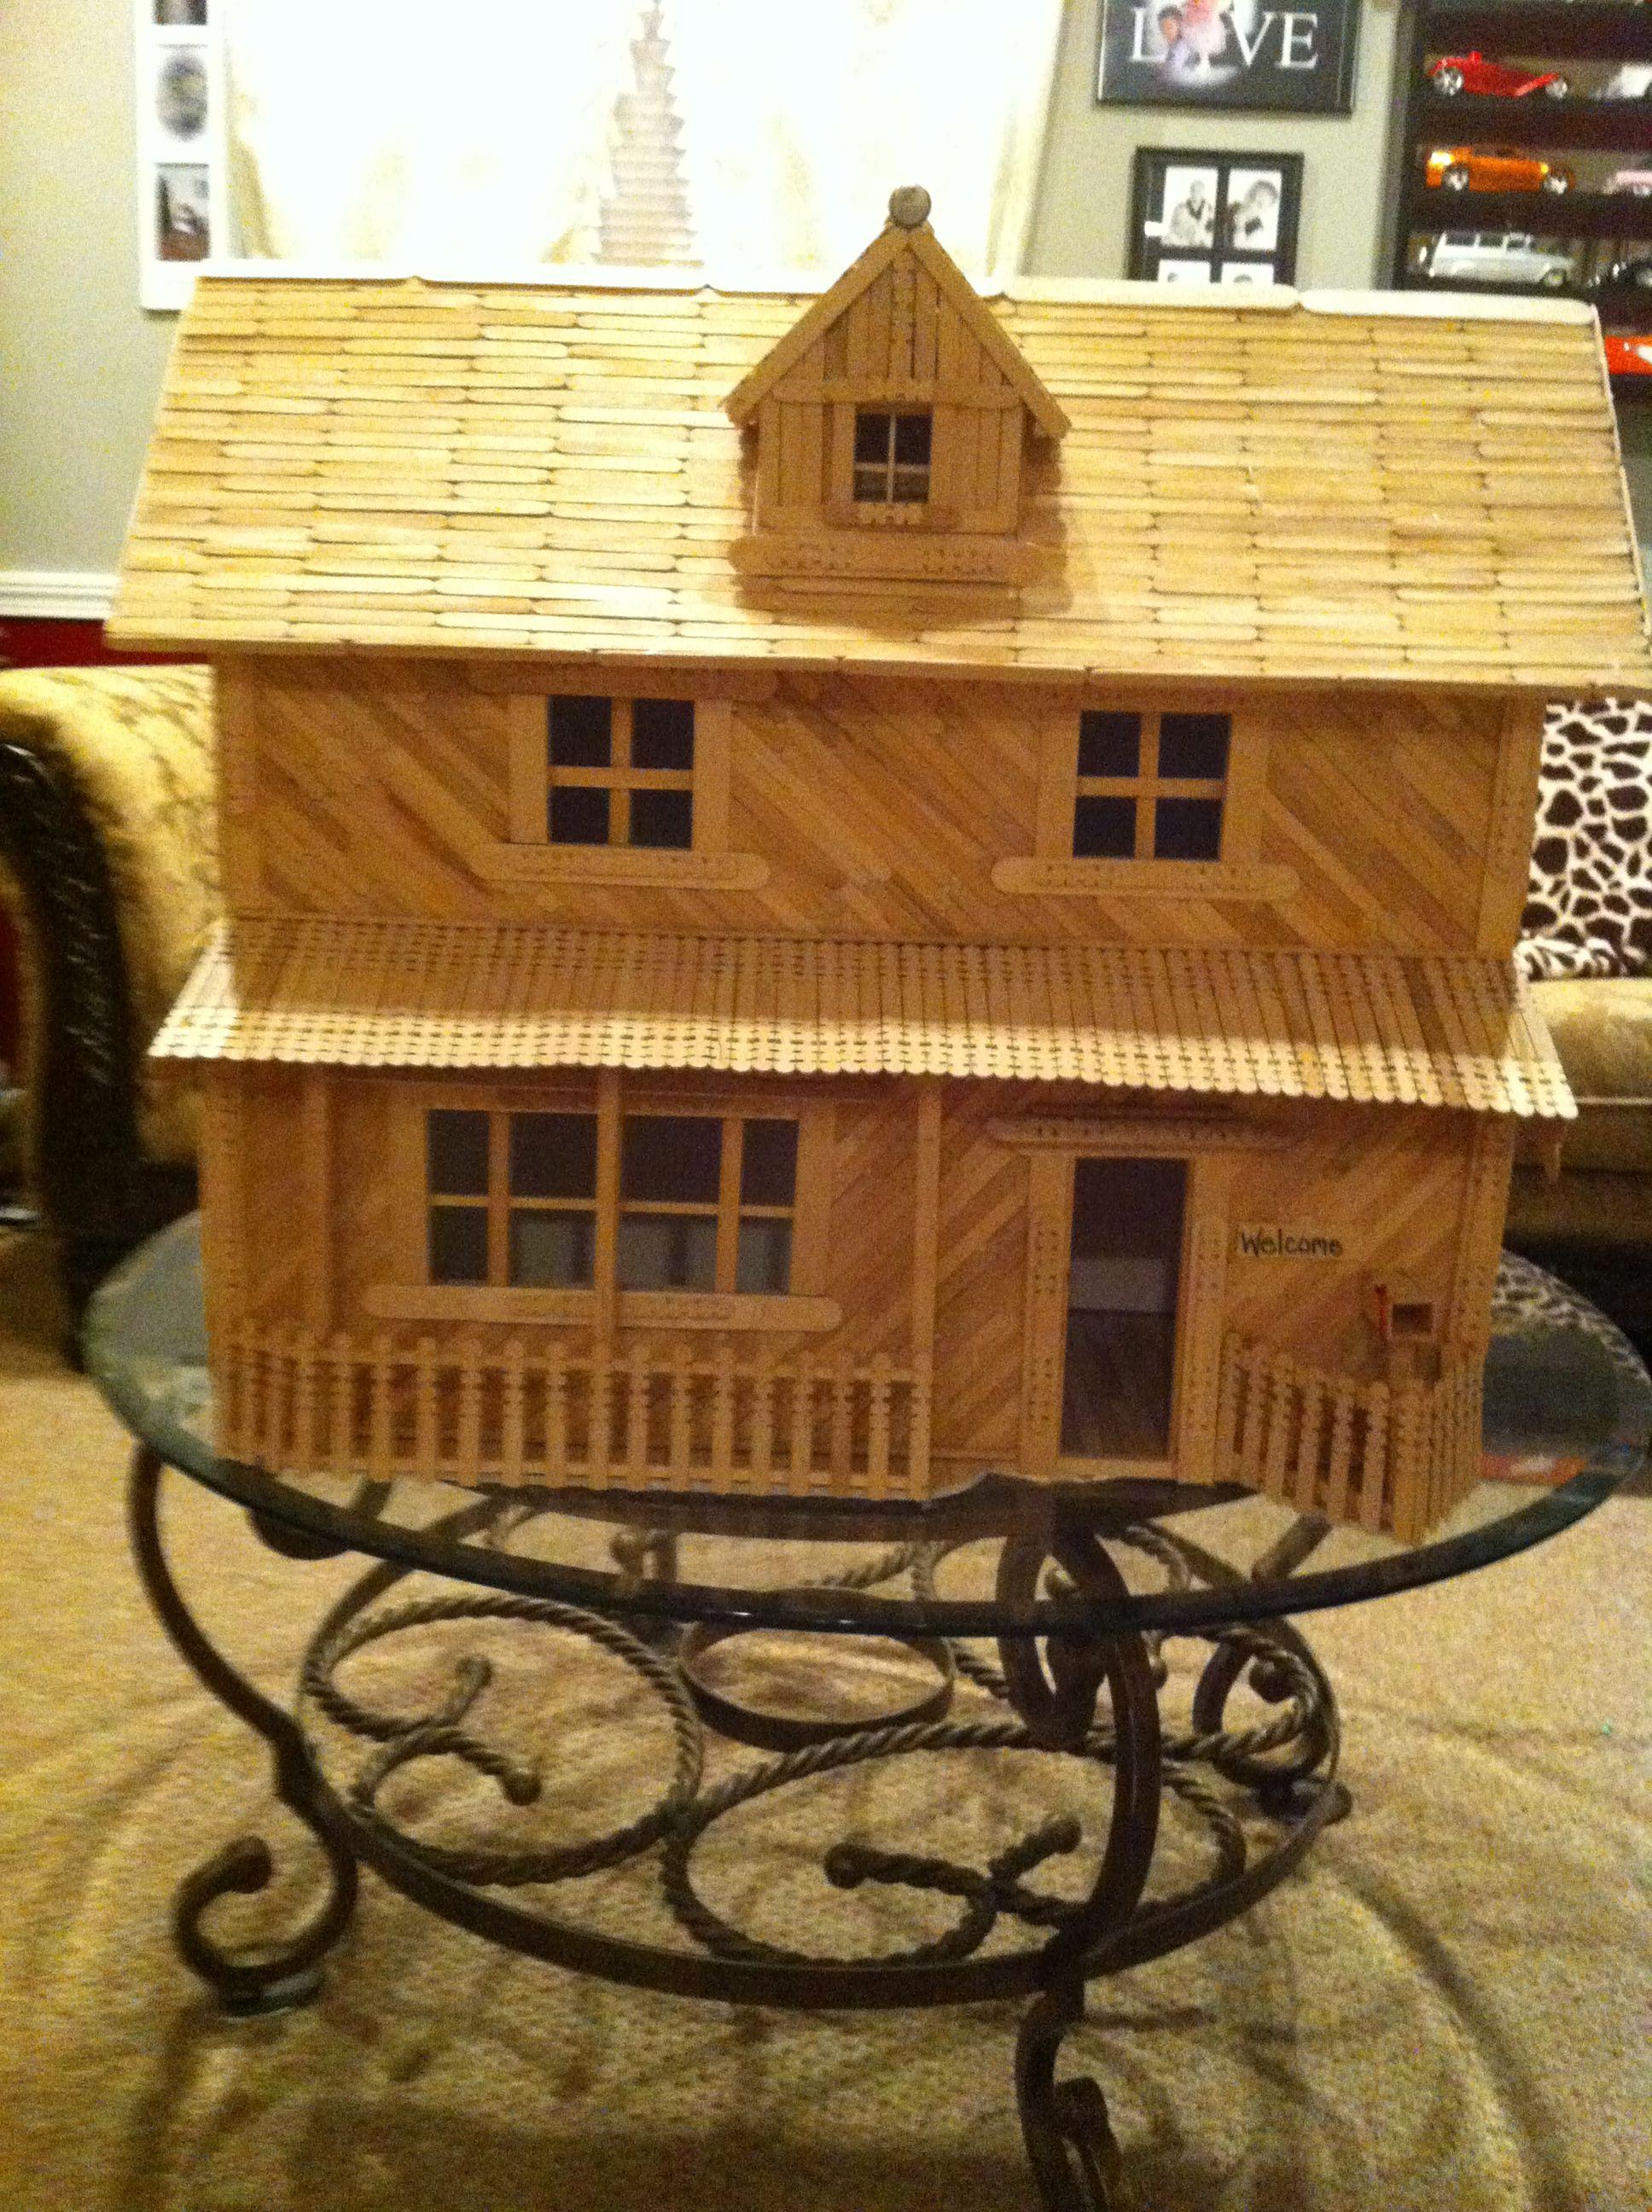 House design using popsicle sticks - Popsicle Stick House